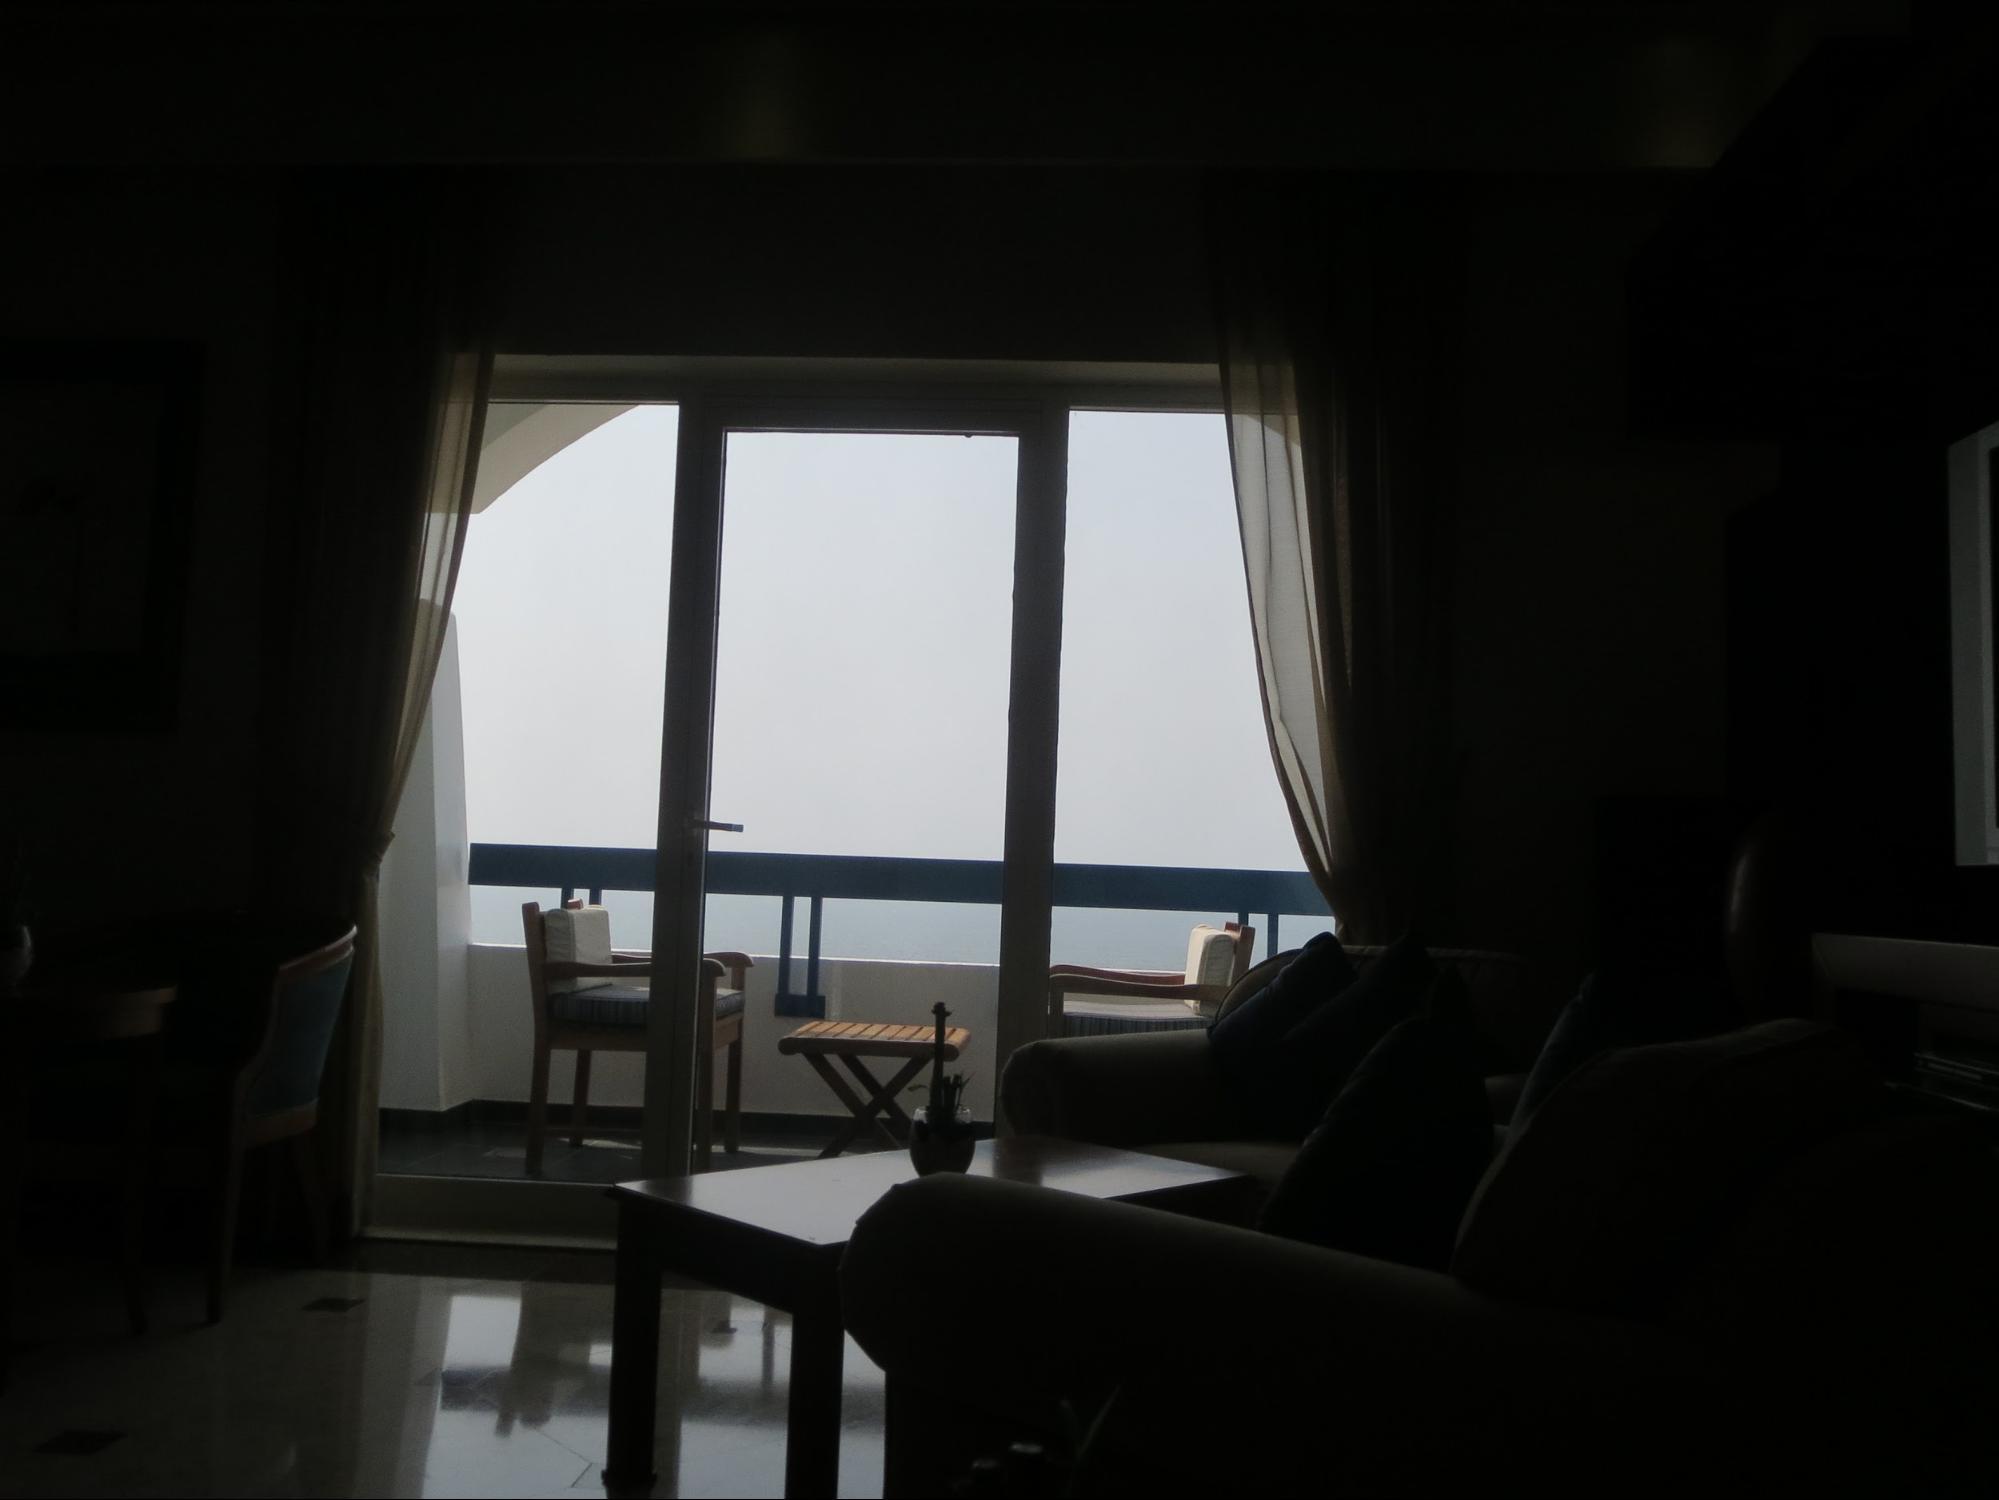 Kempinski Hotel, Ajman Review - Bedroom Balcony